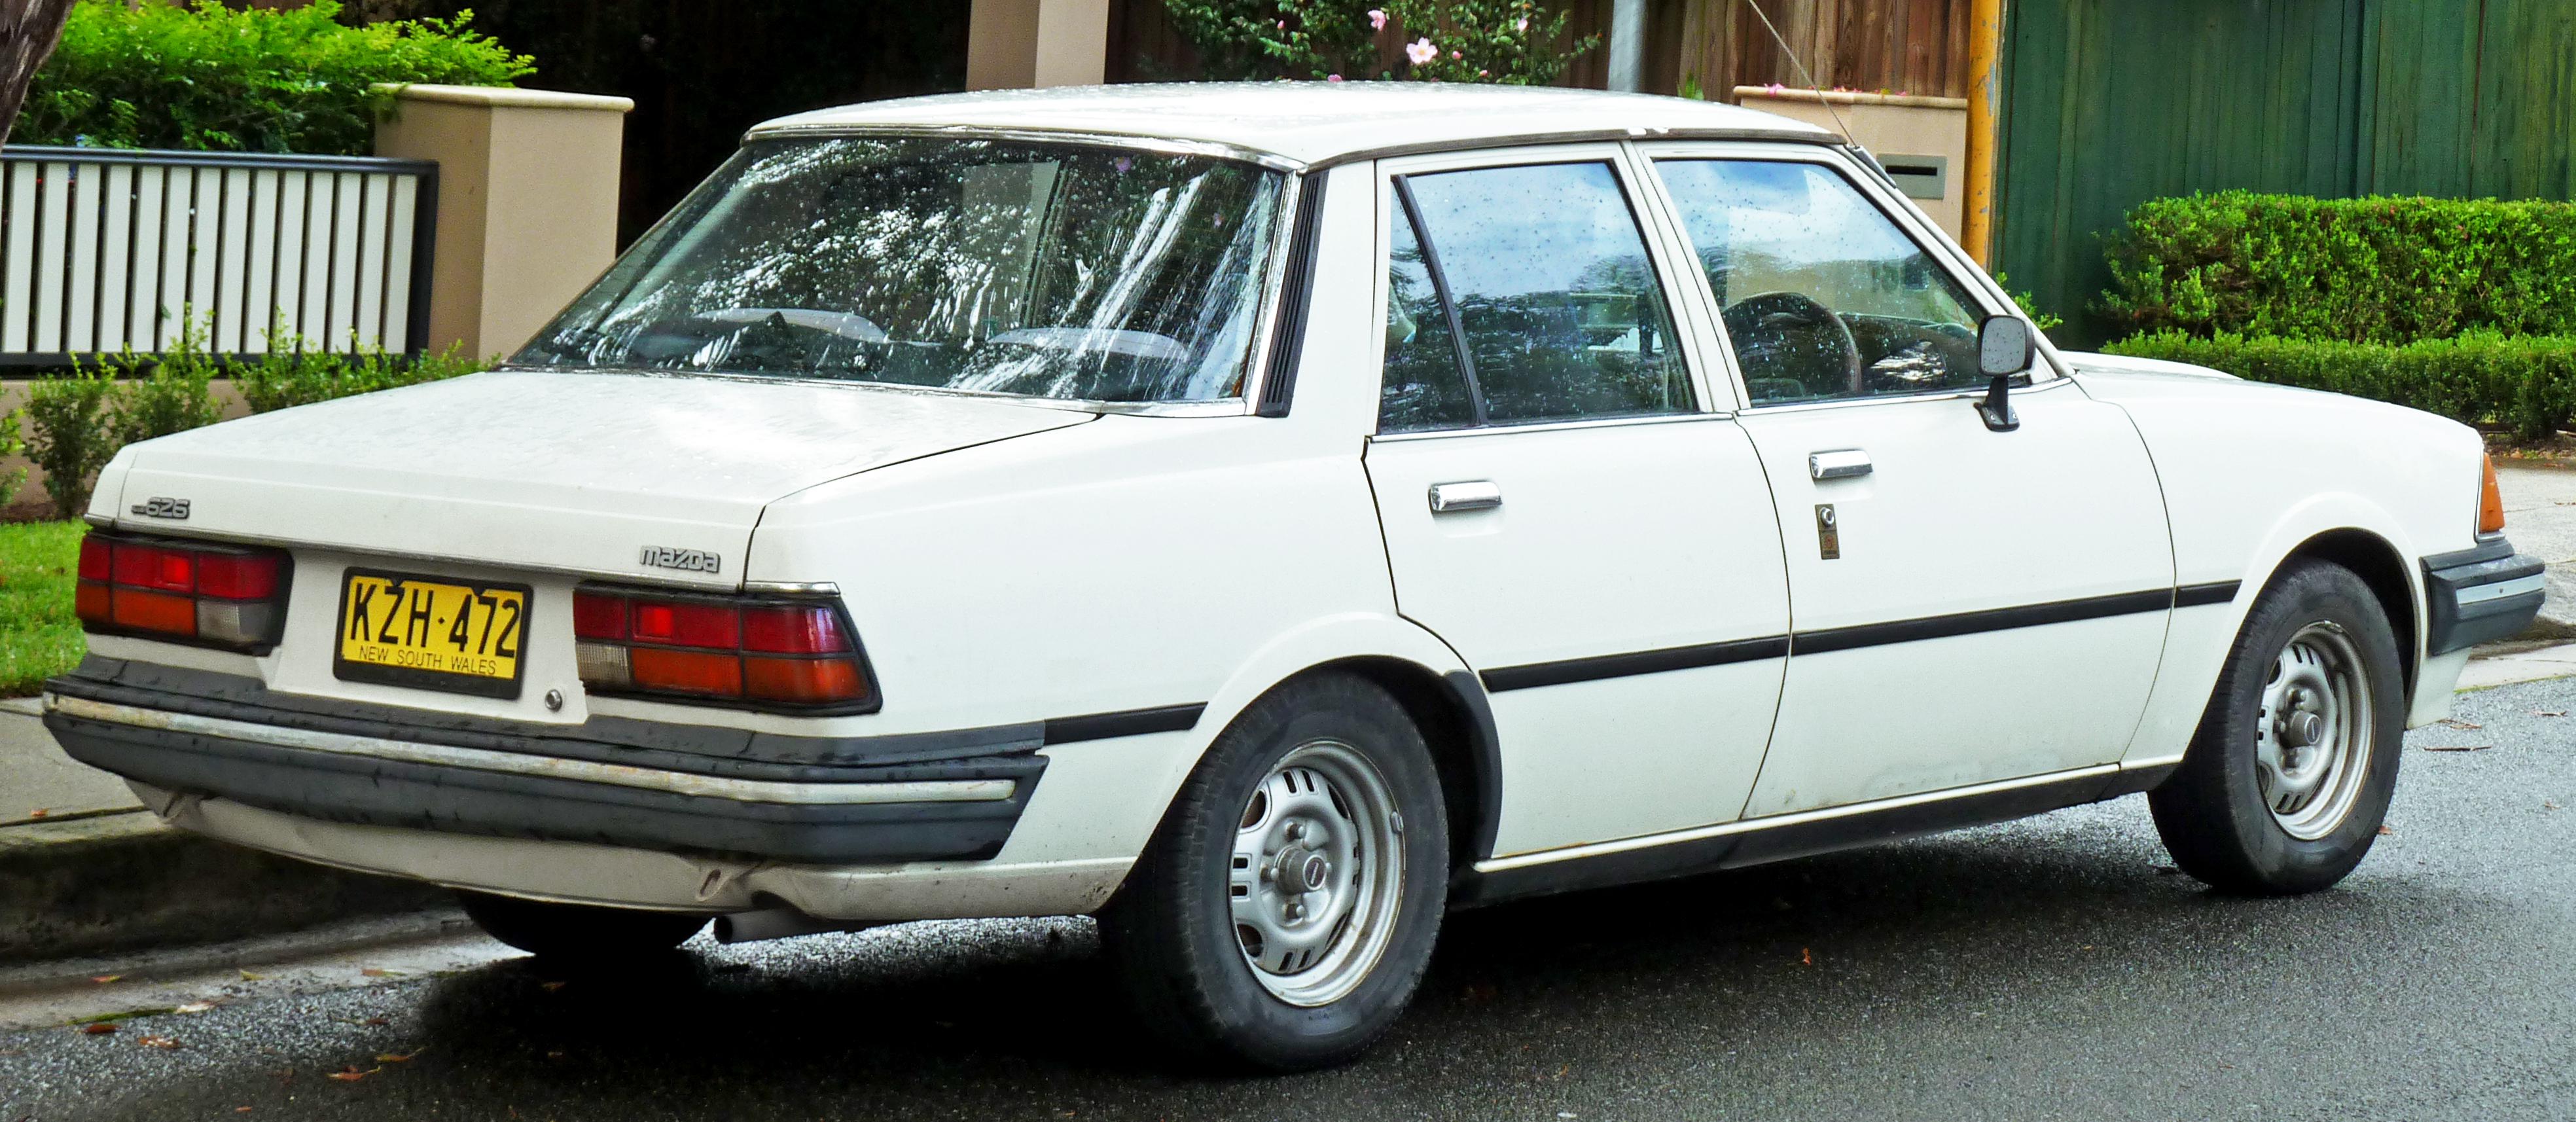 Mazda 626 I (CB) 1978 - 1982 Sedan #4